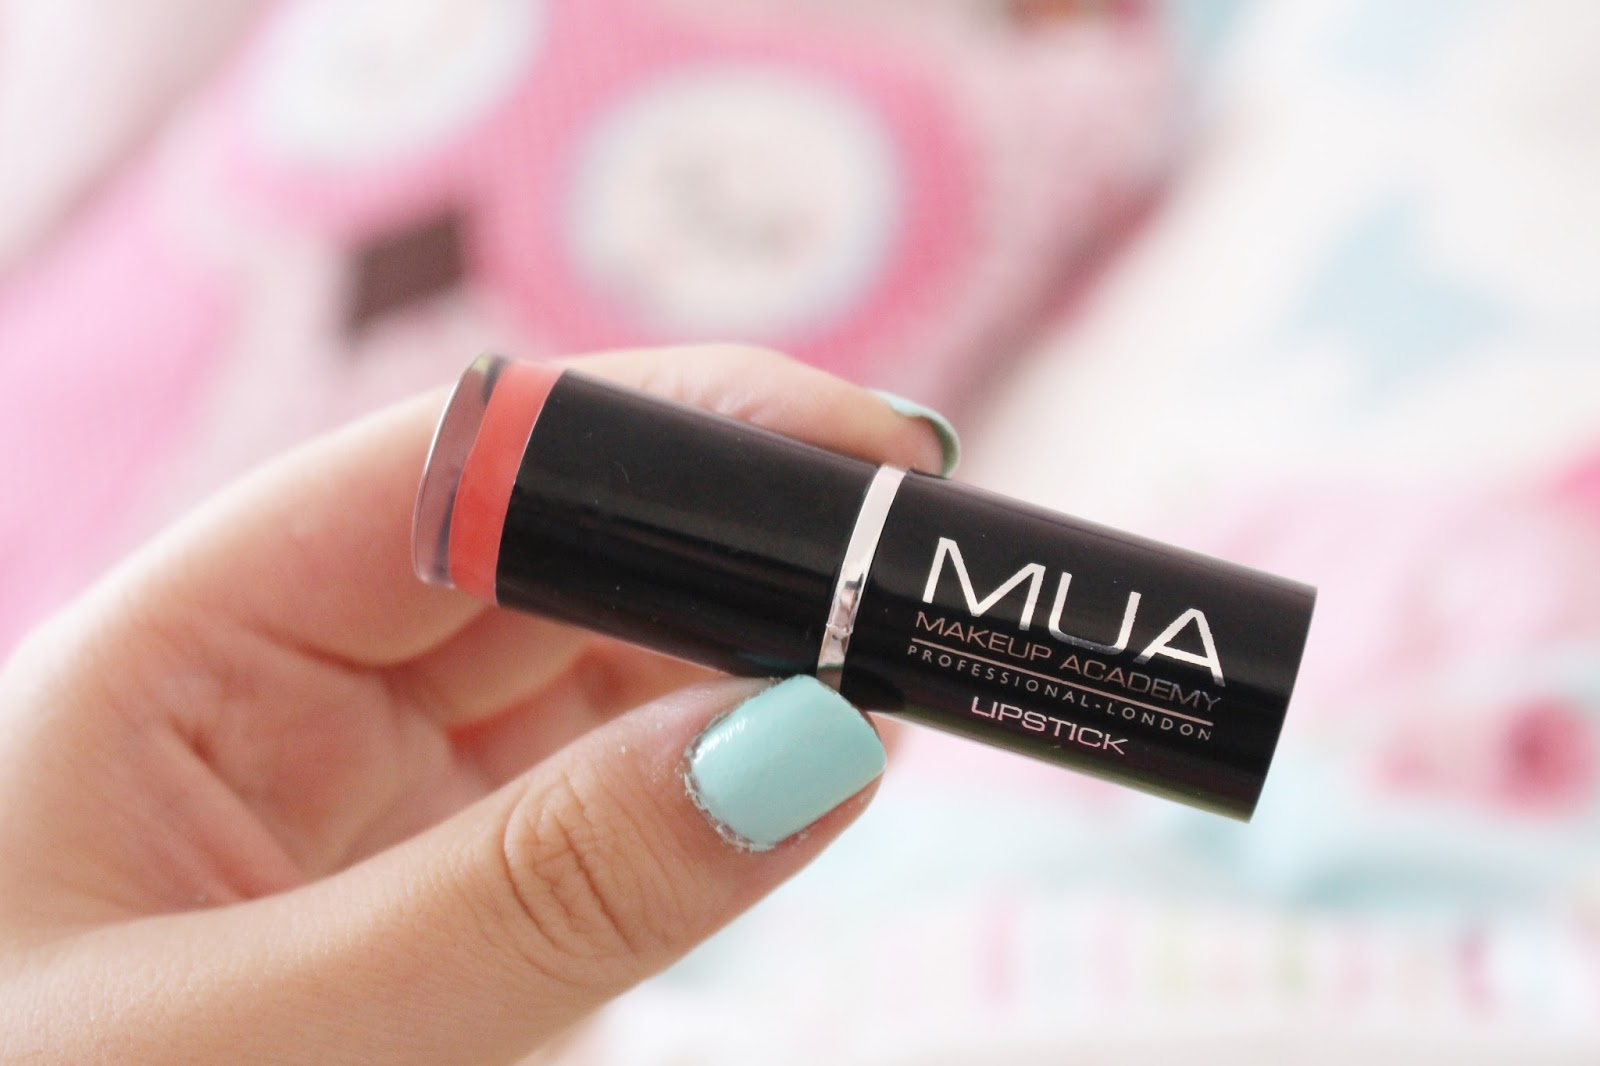 Superdrug Haul MUA Lipstick in Nectar